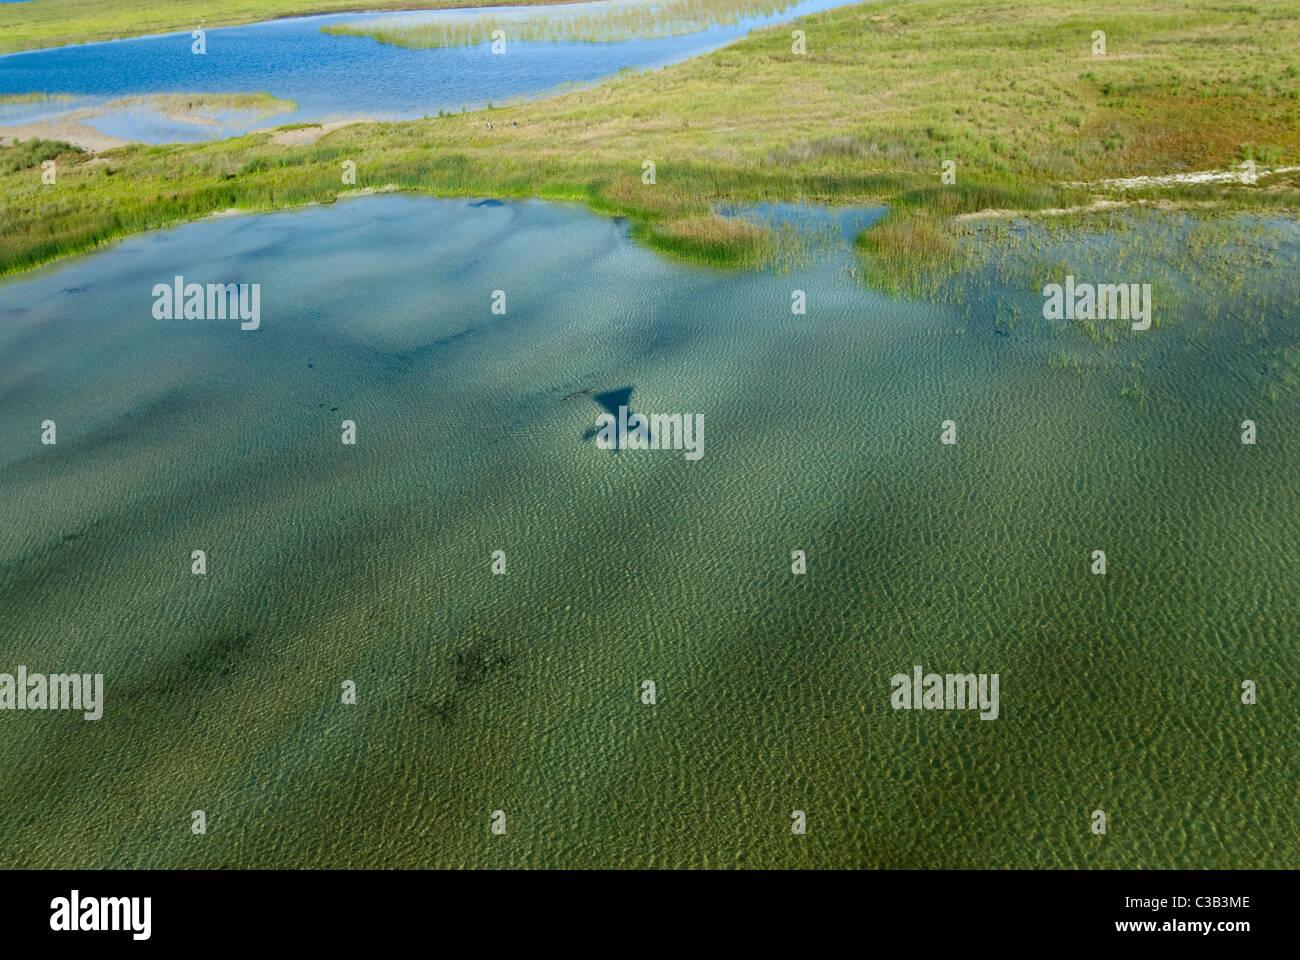 Lake Sibaya, Kwazulu Natal, South Africa Stock Photo